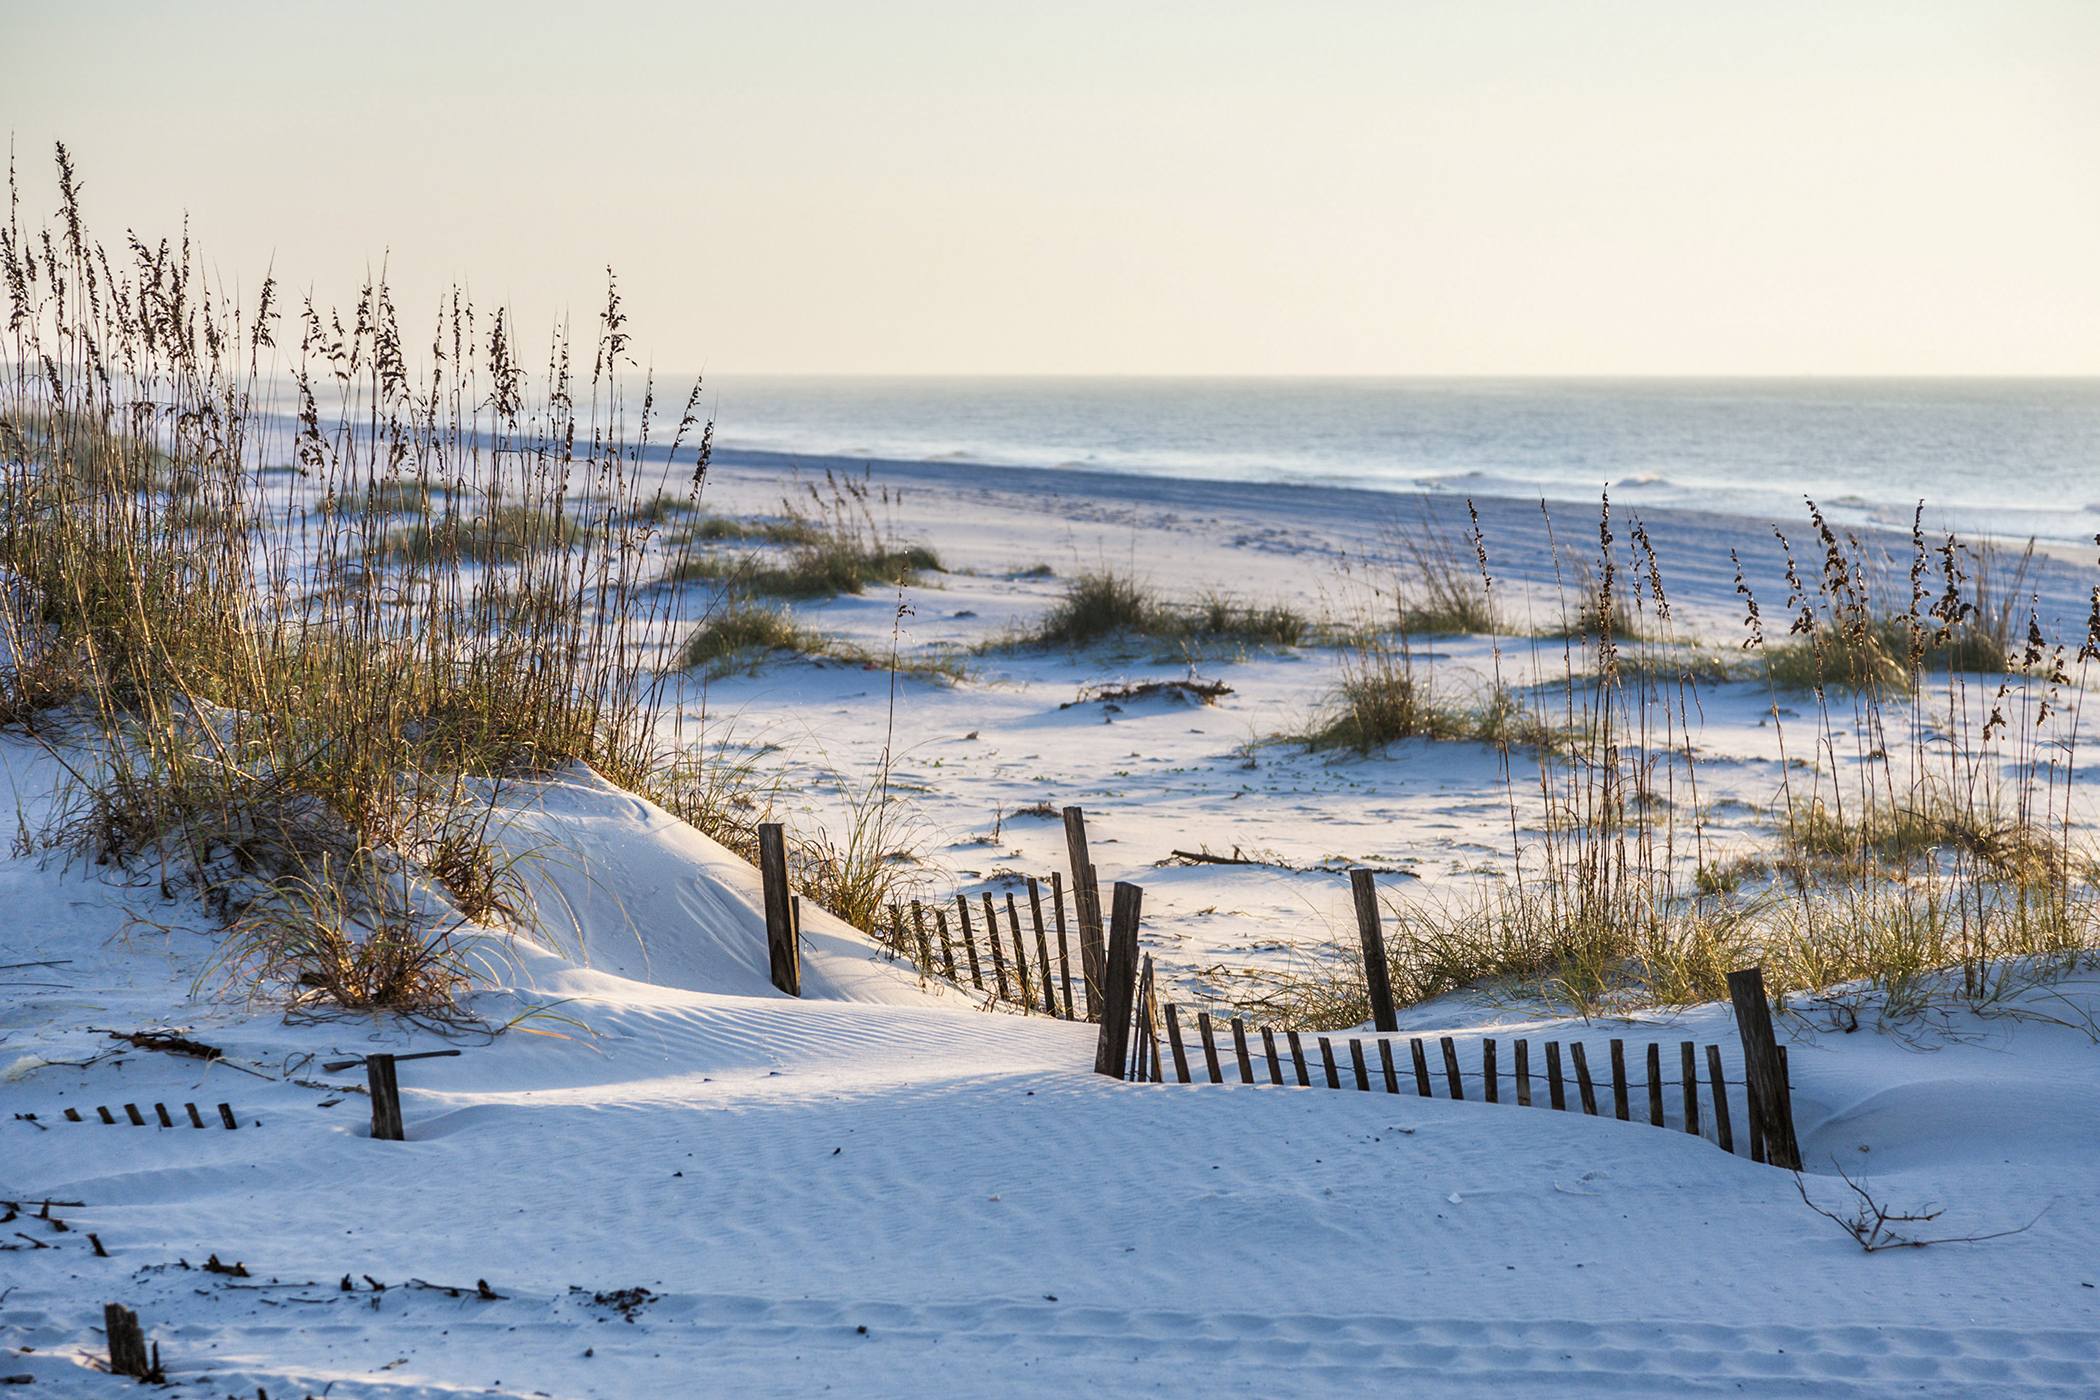 170316-travel-best-beaches-gulf-shores-alabama